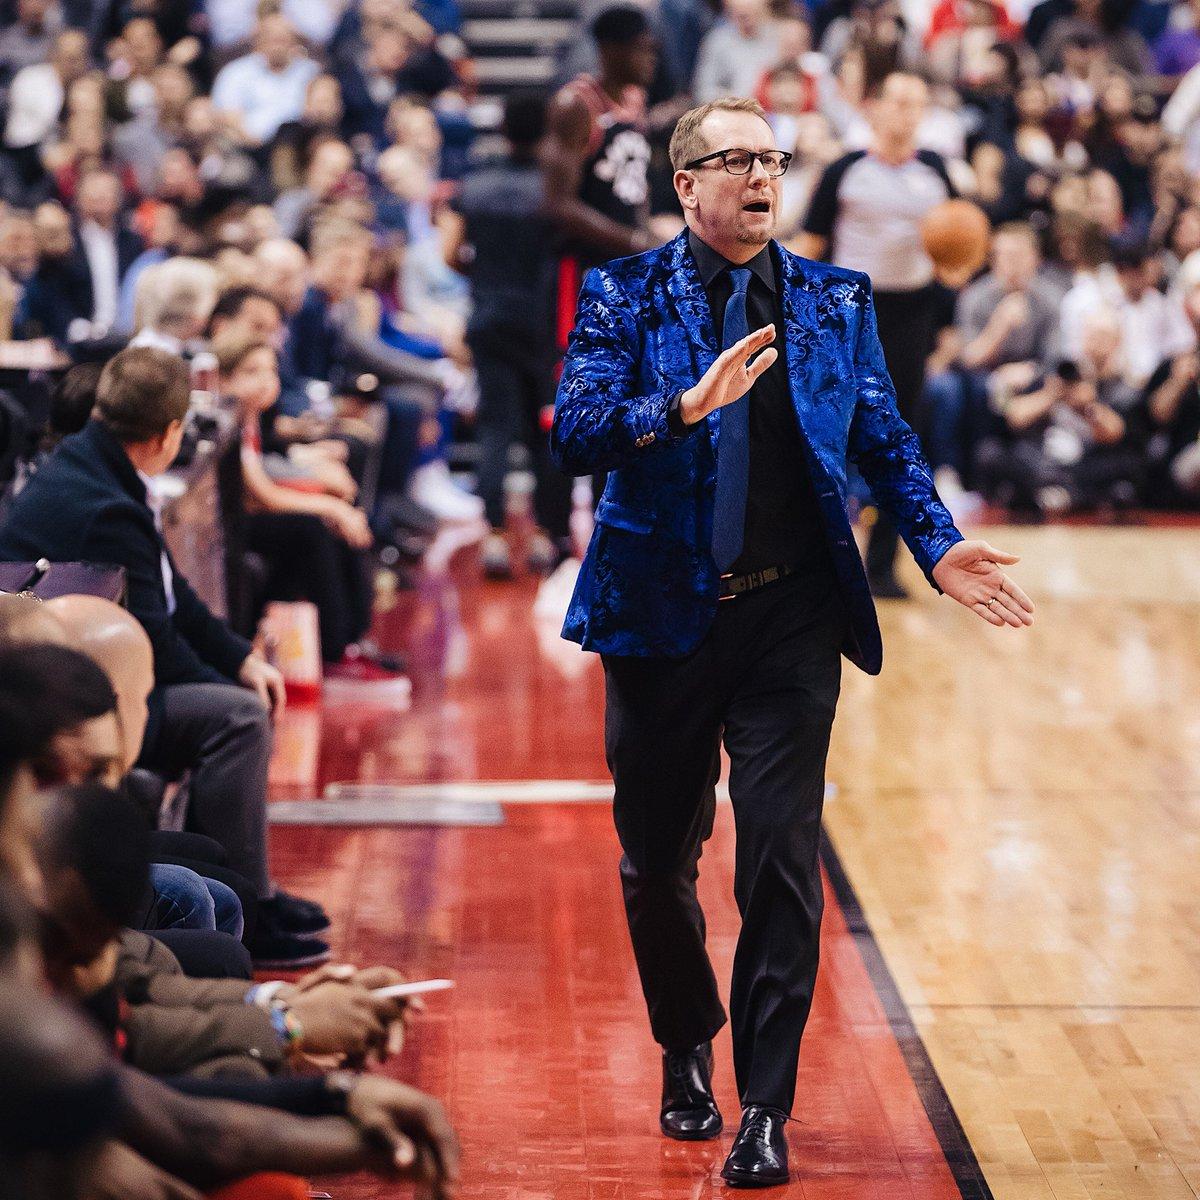 [Post Game Thread] The Toronto Raptors (19-4) Defeat The